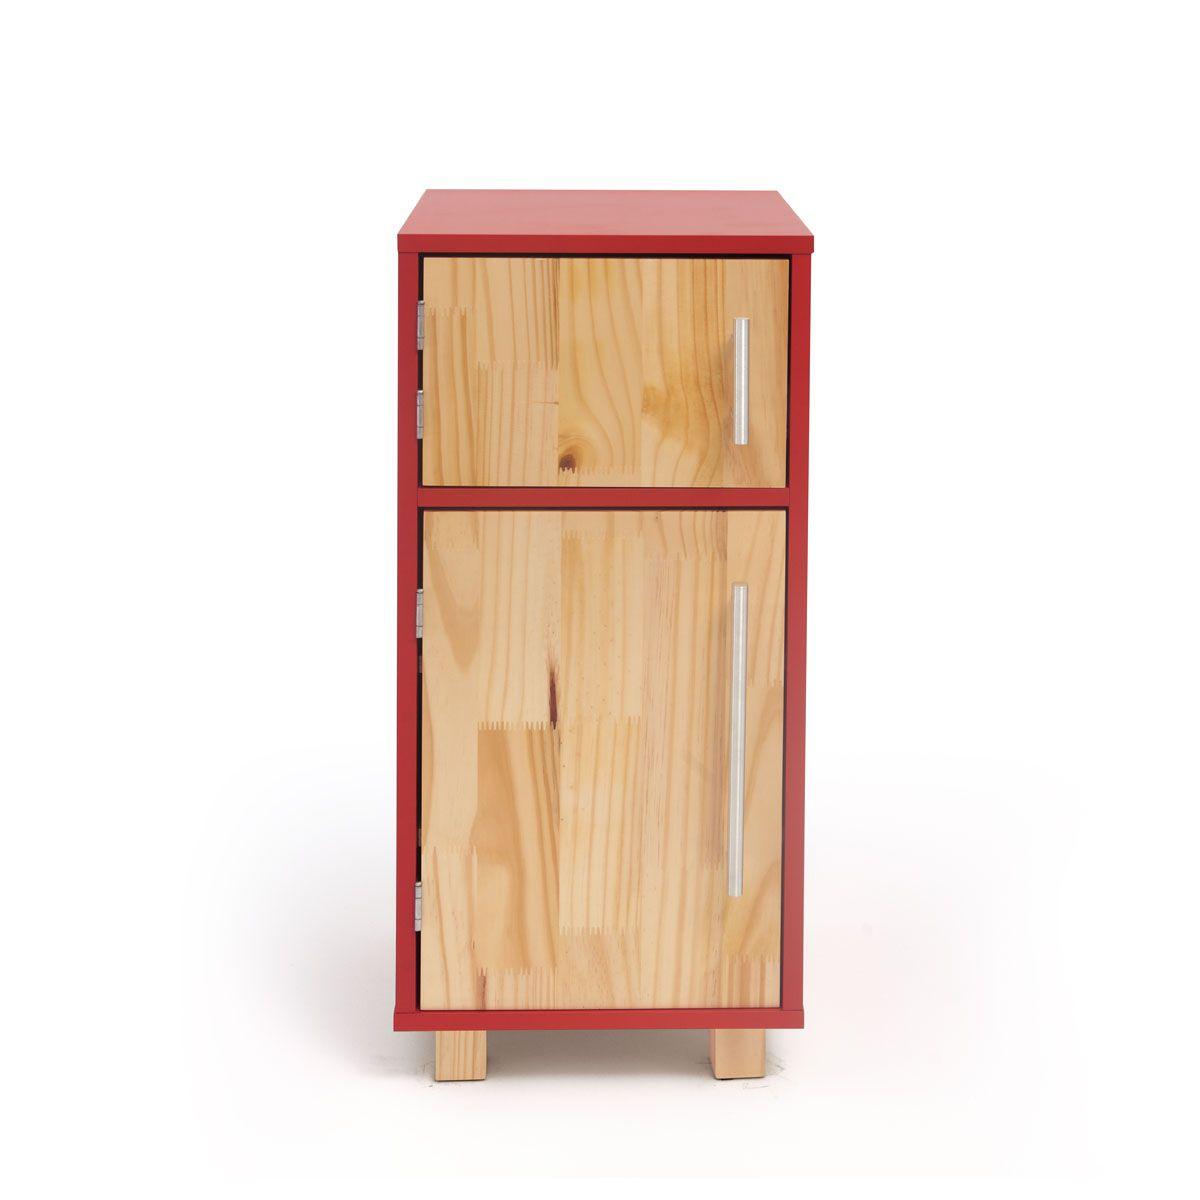 Mini Geladeira - Vermelha